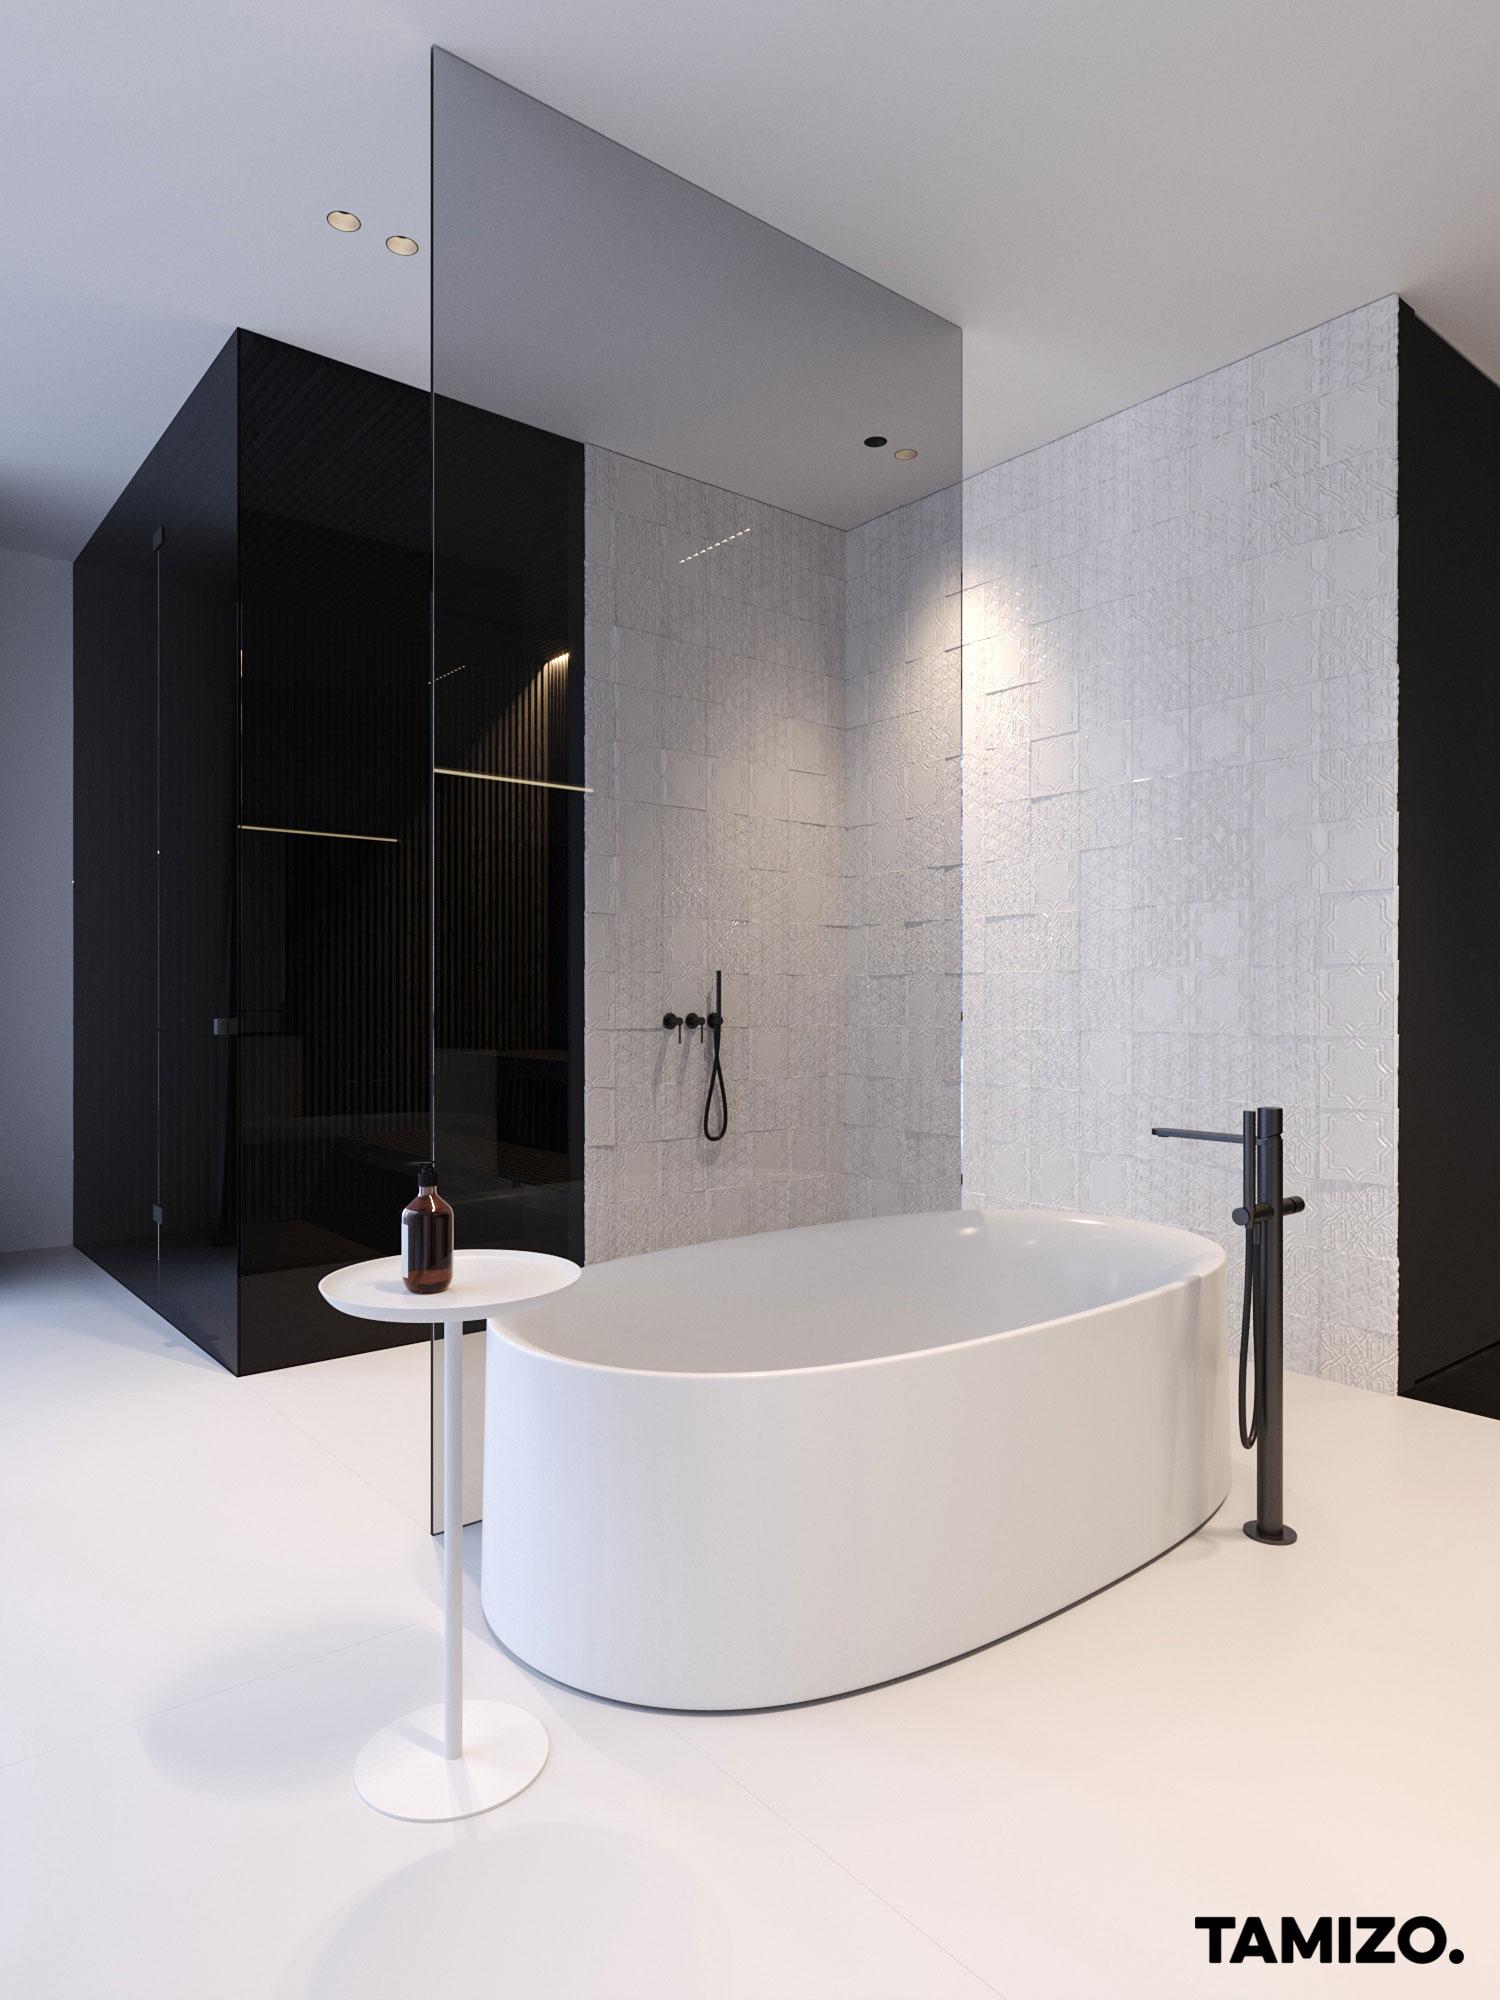 tamizo_architects_mateusz_kuo_stolarski_tomaszow_mazowiecki_interior_design_house_minimal_17